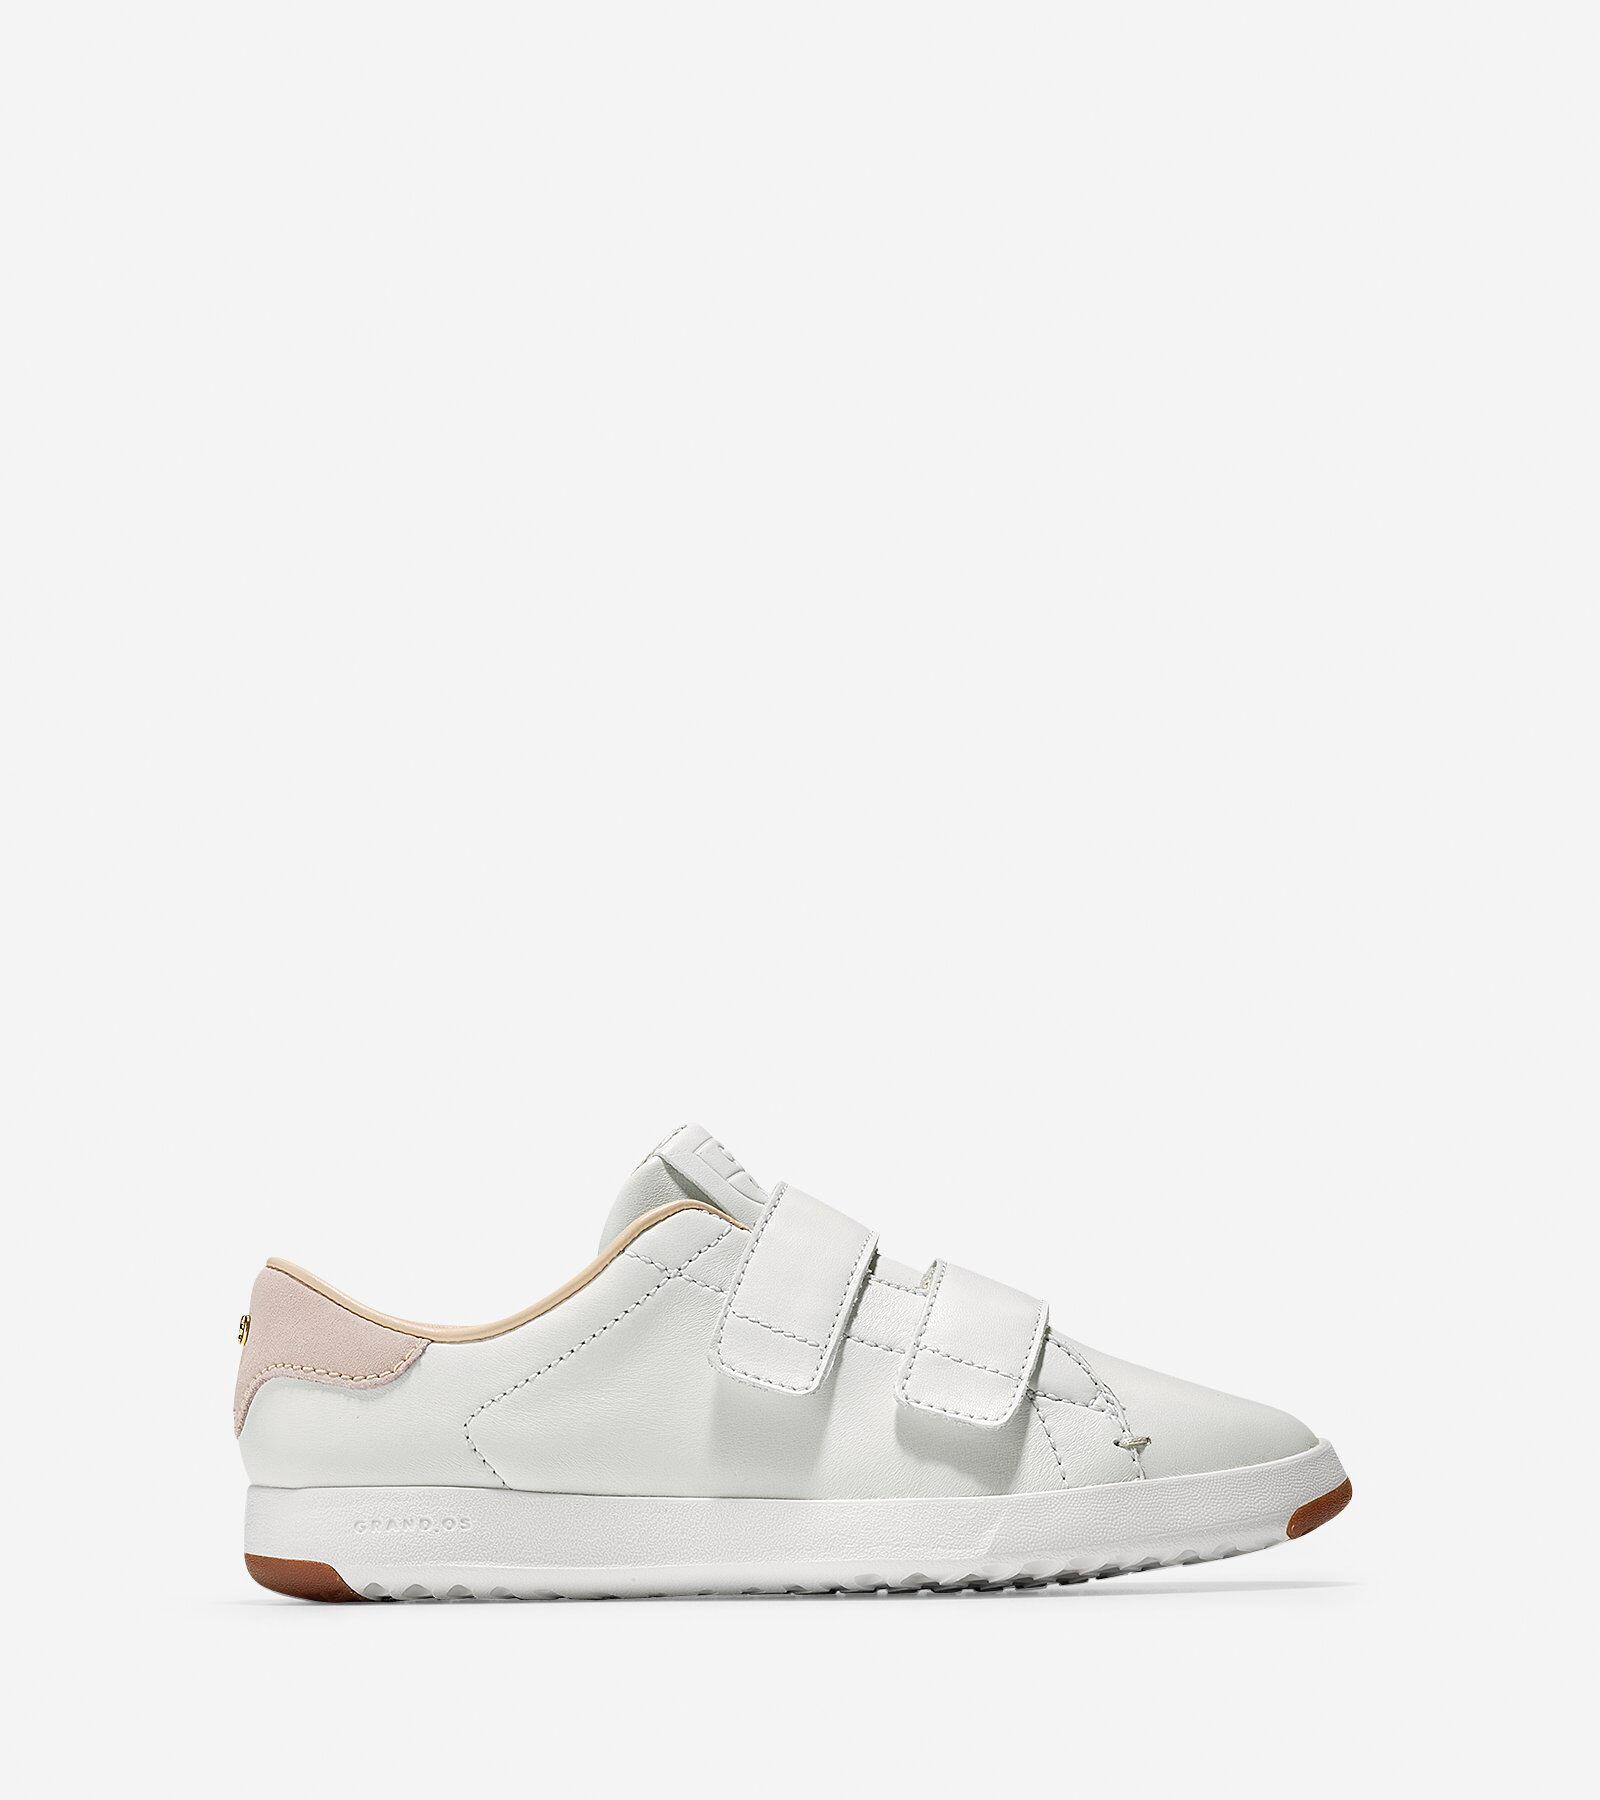 GrandPro Tennis Sneakers in Optic White | Cole Haan